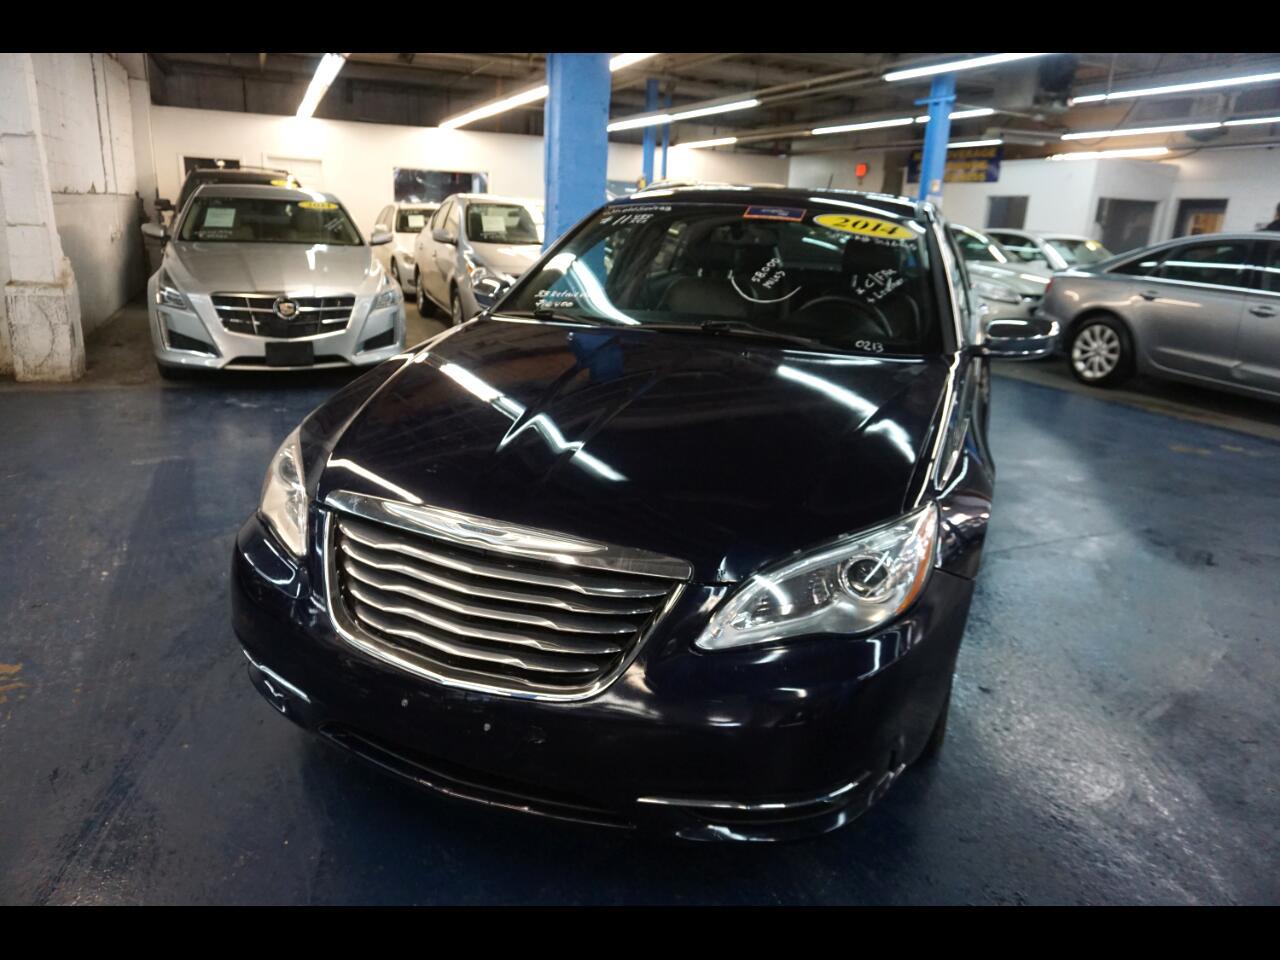 2014 Chrysler 200 4dr Sdn Limited